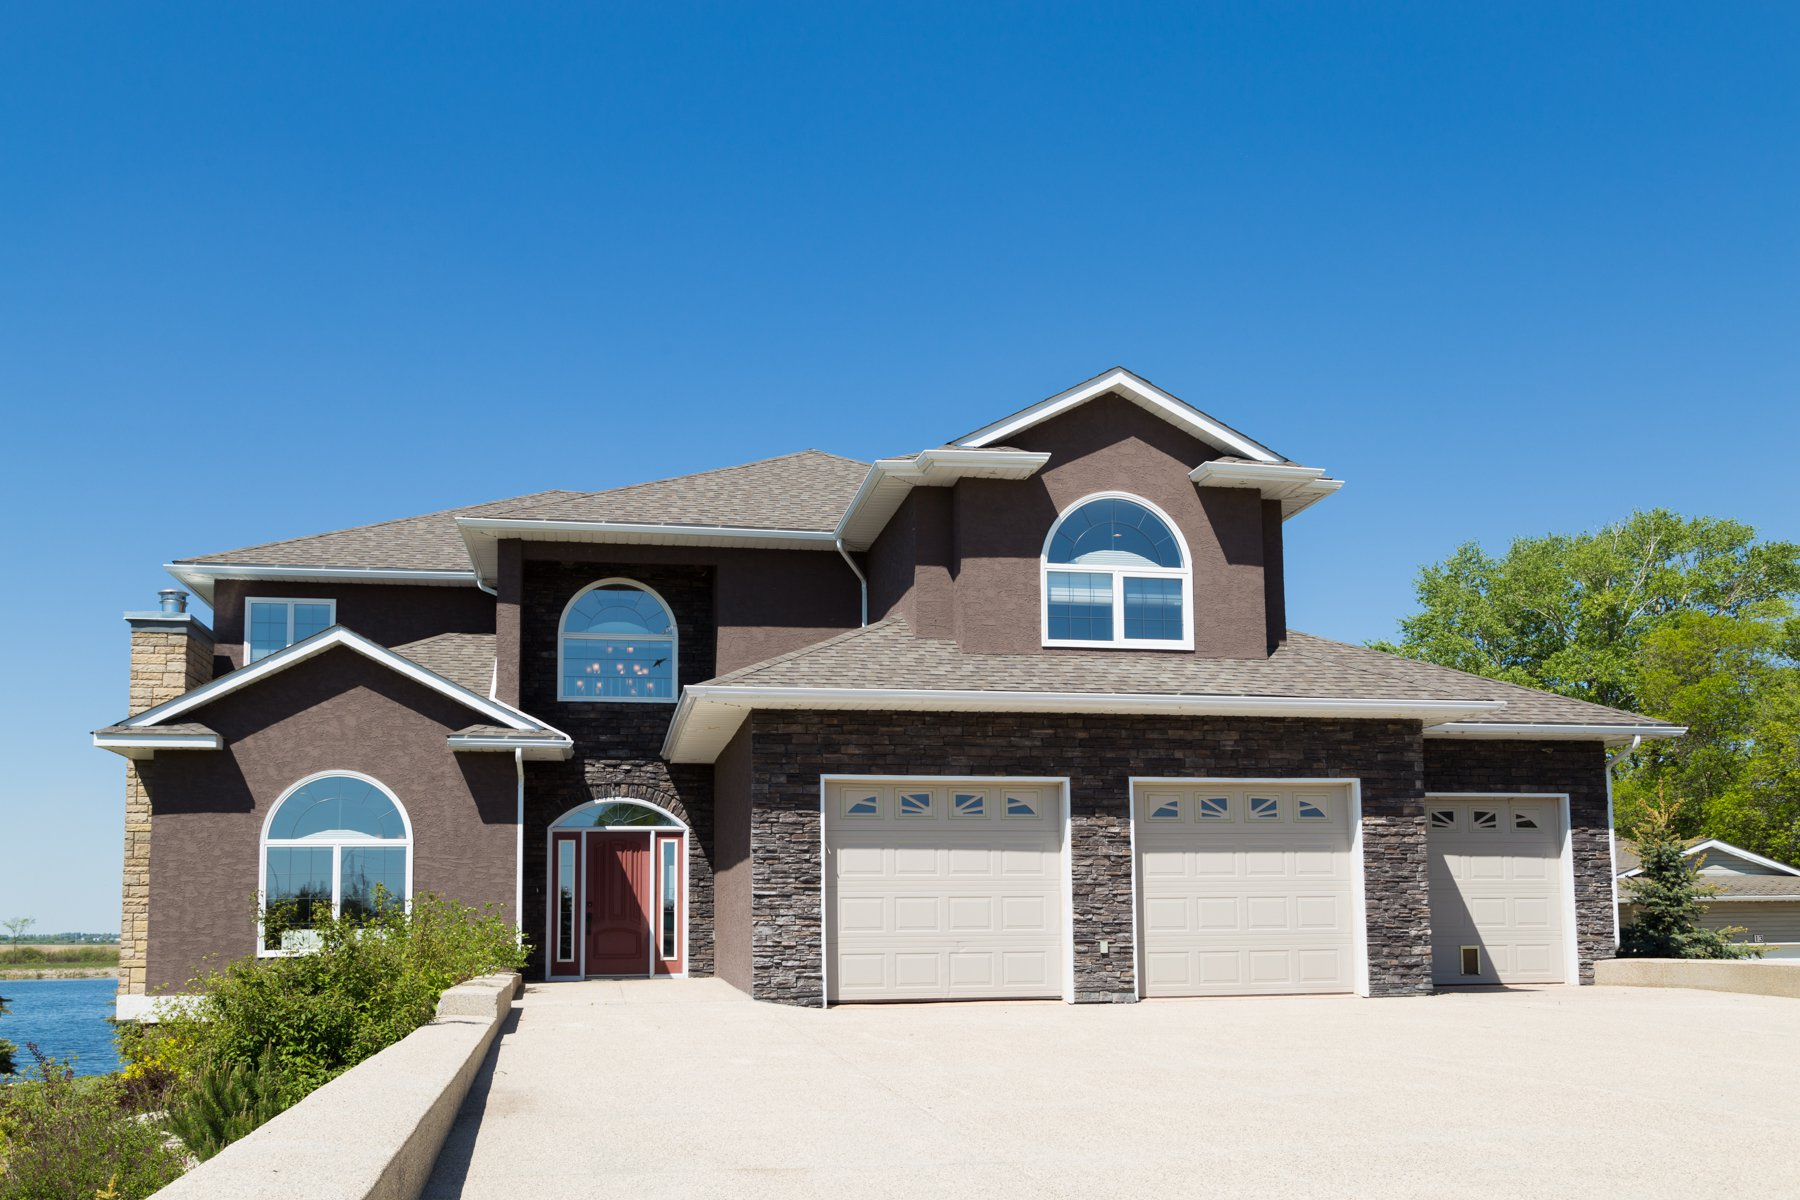 Main Photo: 12 Links Drive in Killarney: House for sale : MLS®# 1714297